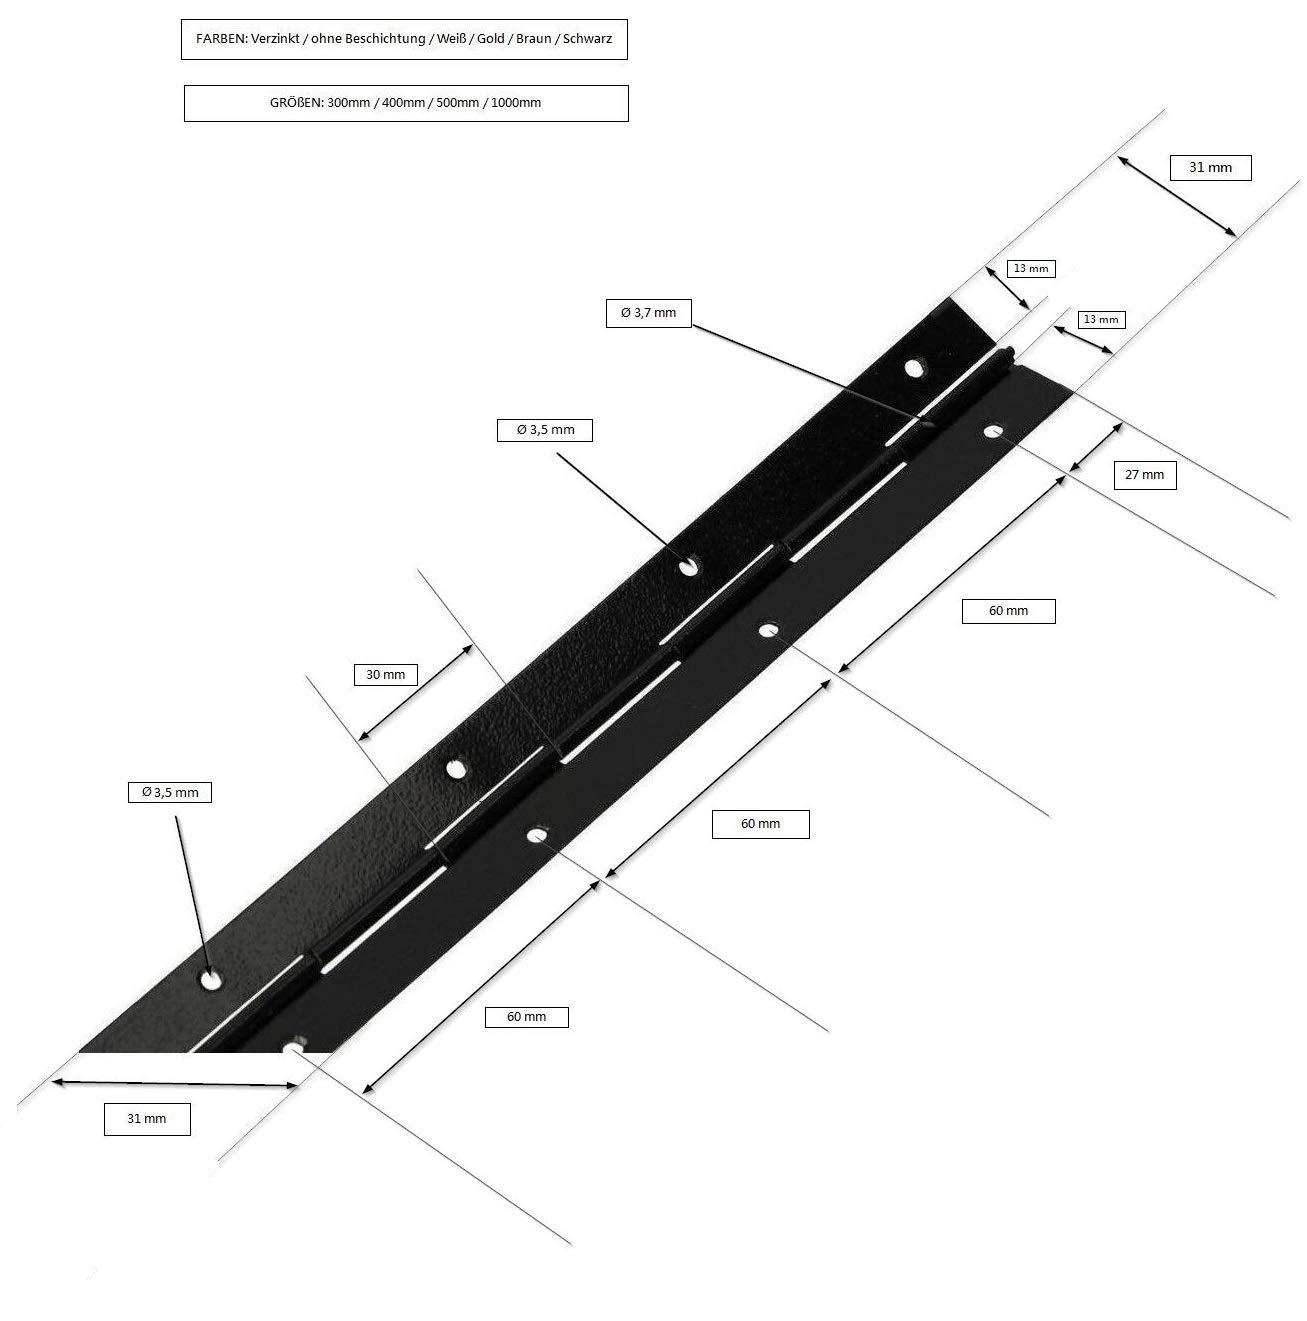 KOTARBAU Stangenscharnier Klavierband 500//31 mm Alle Farben Teilbar//Schneidbar Scharnier K/ürzbar Stabil Anschwei/ßband Scharnierband M/öbelscharnier 1, Wei/ß